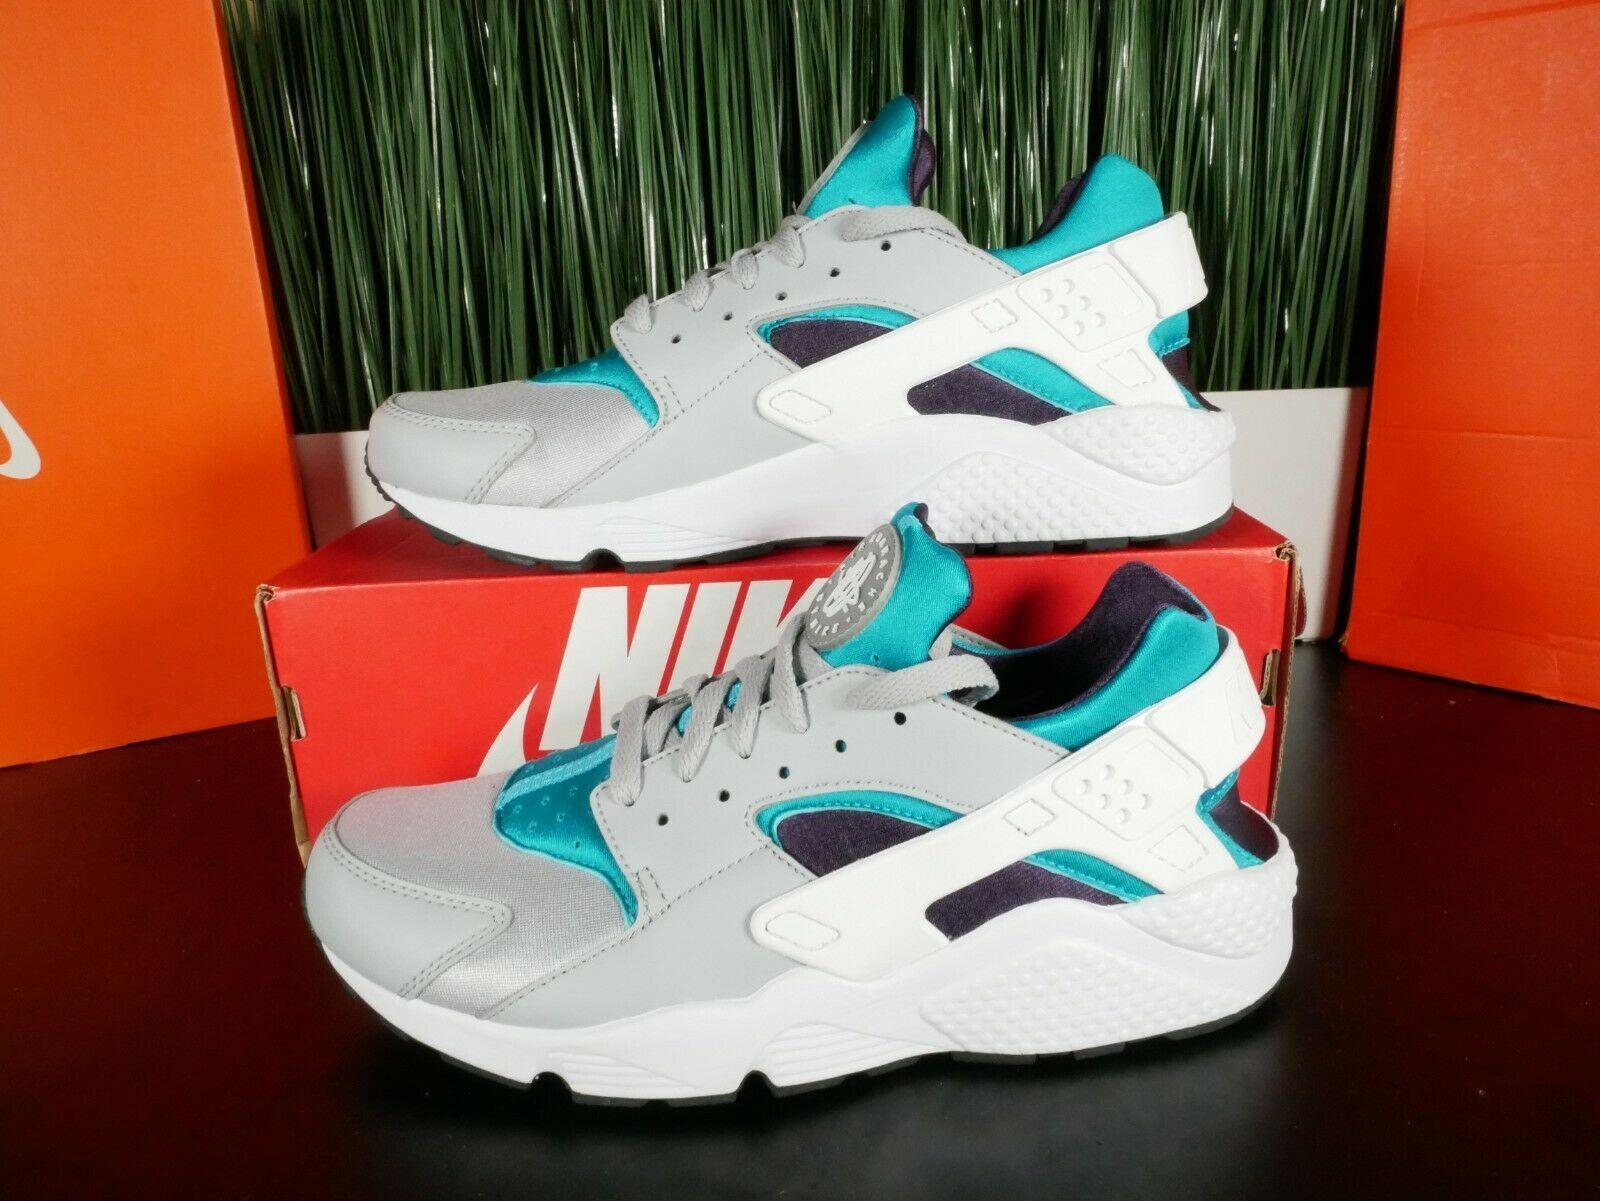 Nike Air Huarache Wolf Grey/White Aquatone Running Shoes 318429 ...